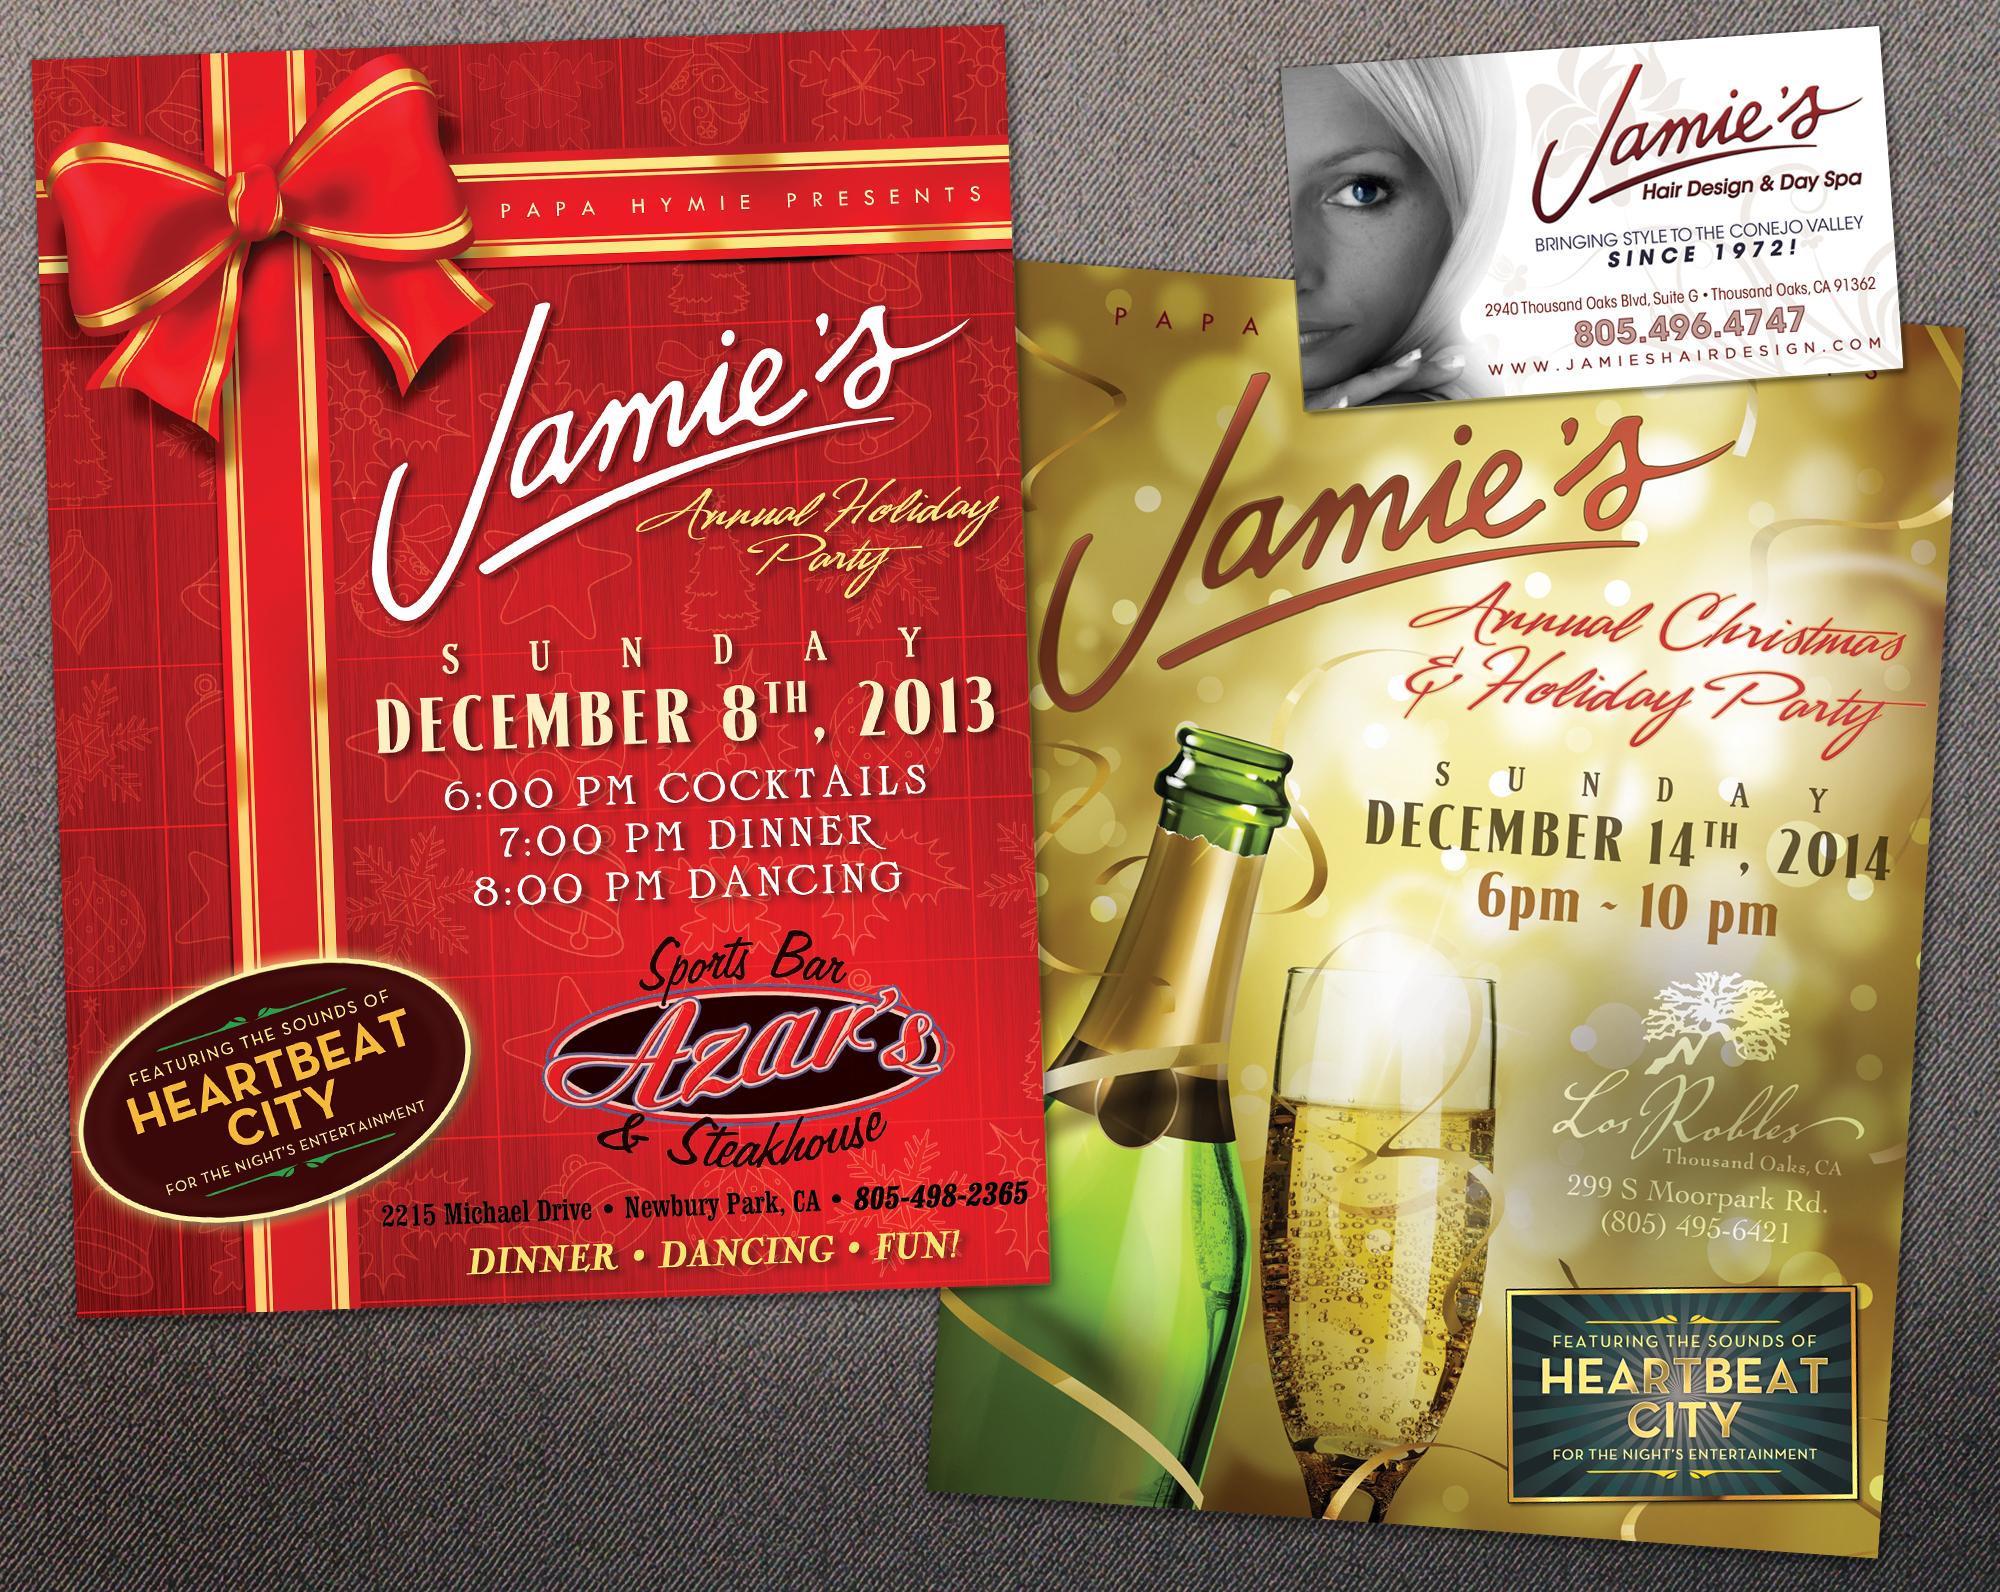 Jamie's Hair Design Holiday Flyers & Business Card